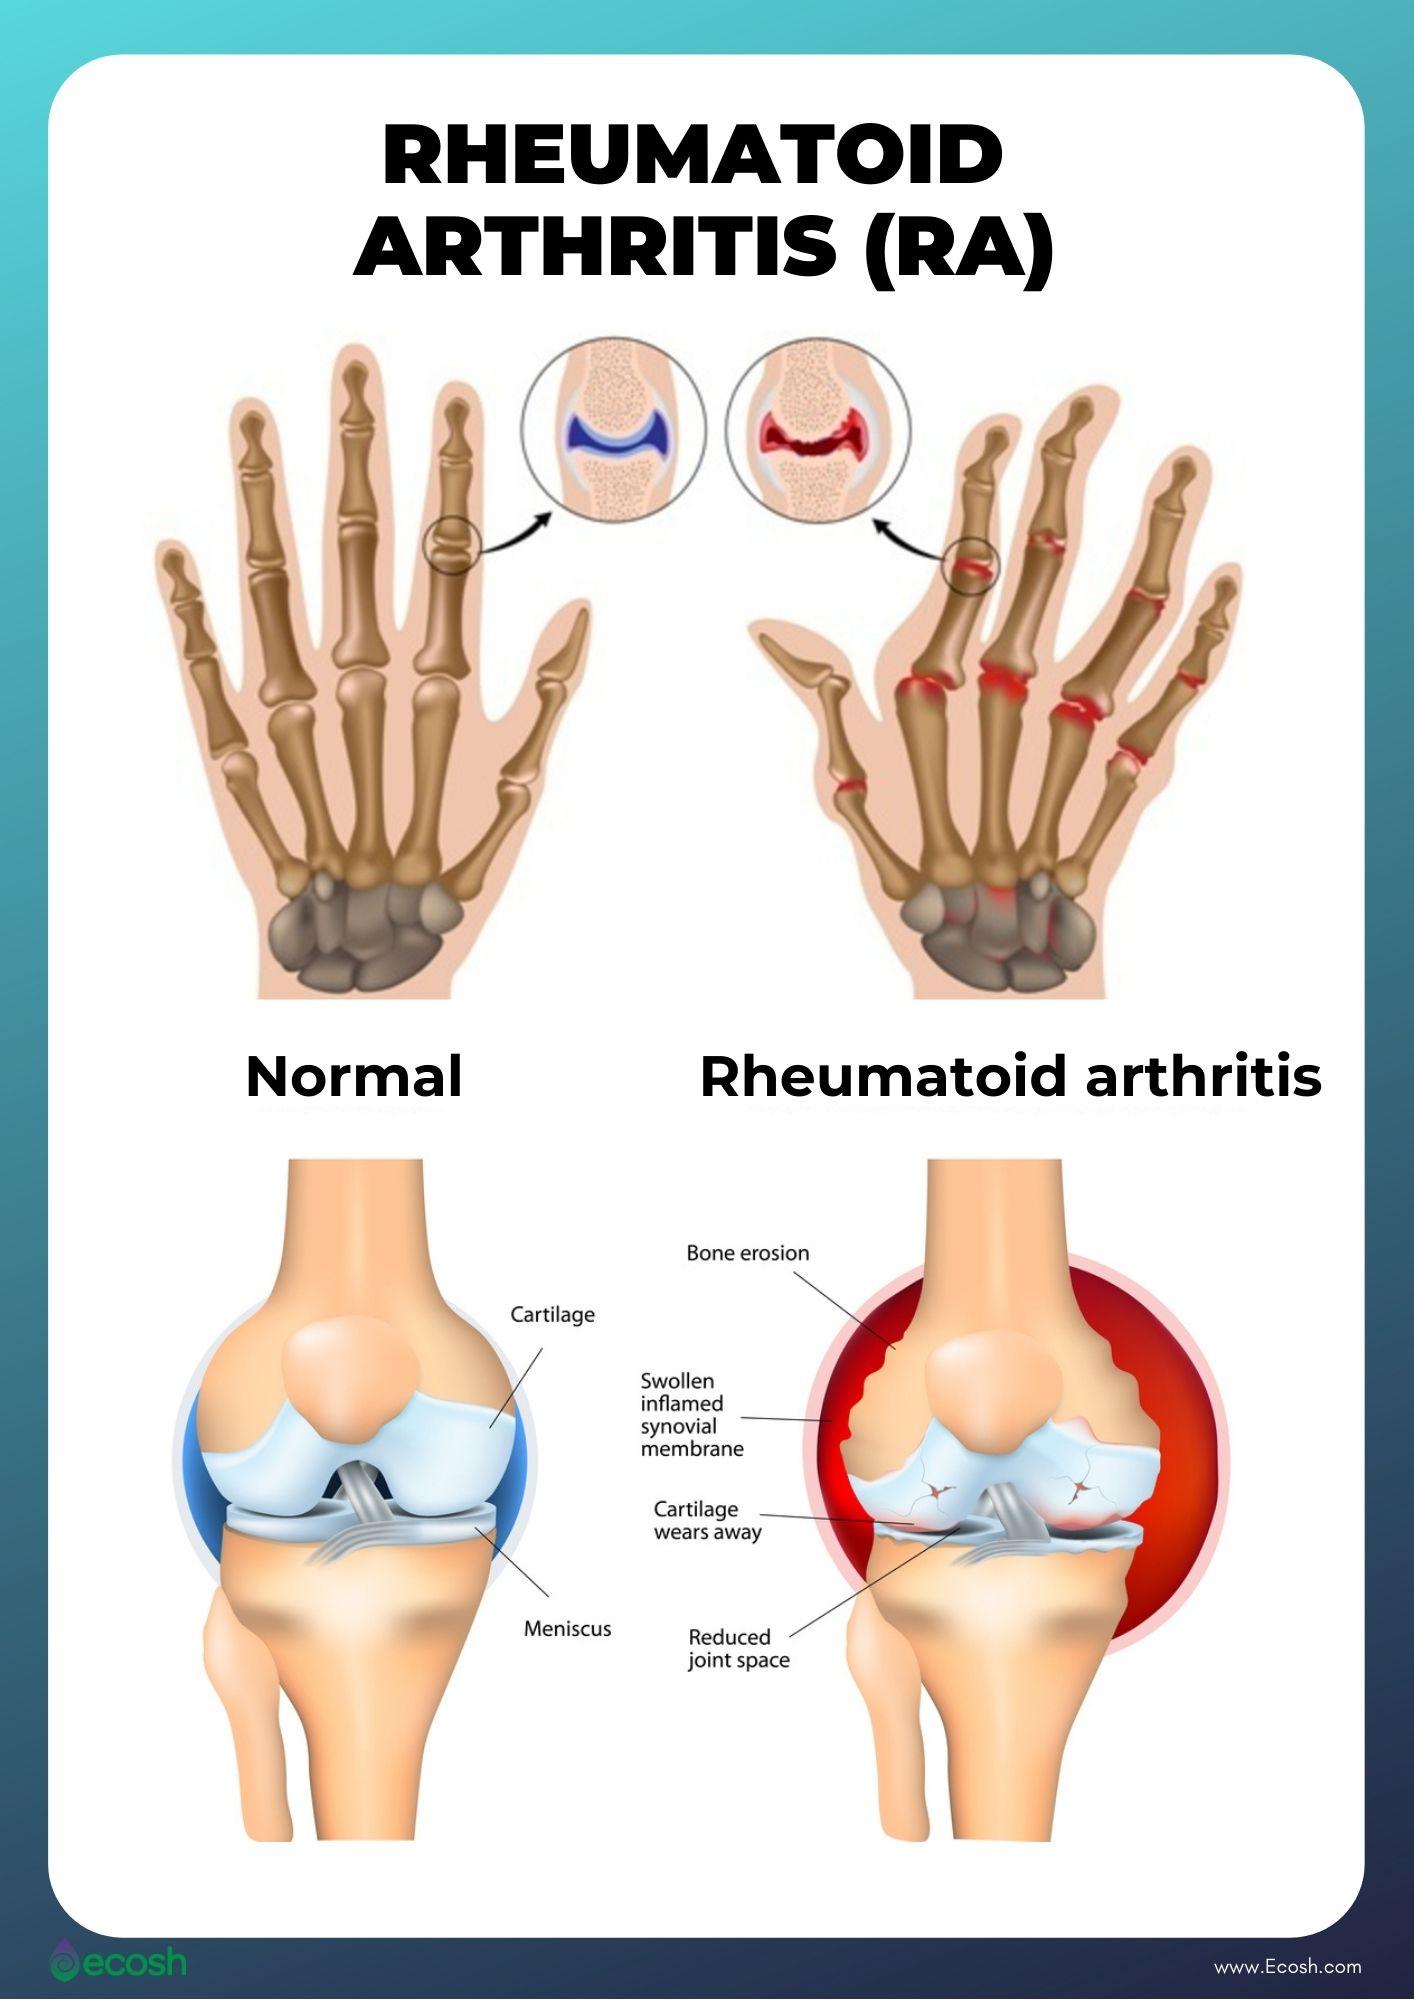 Ecosh_Rheumatoid_Arthritis_Symptoms_Rheumatoid_Arthritis_Causes_Rheumatoid_Arthritis_Signs_Rheumatoid_Arthritis_Risk_Factors_Rheumatoid_Arthritis_Bone_Erosion